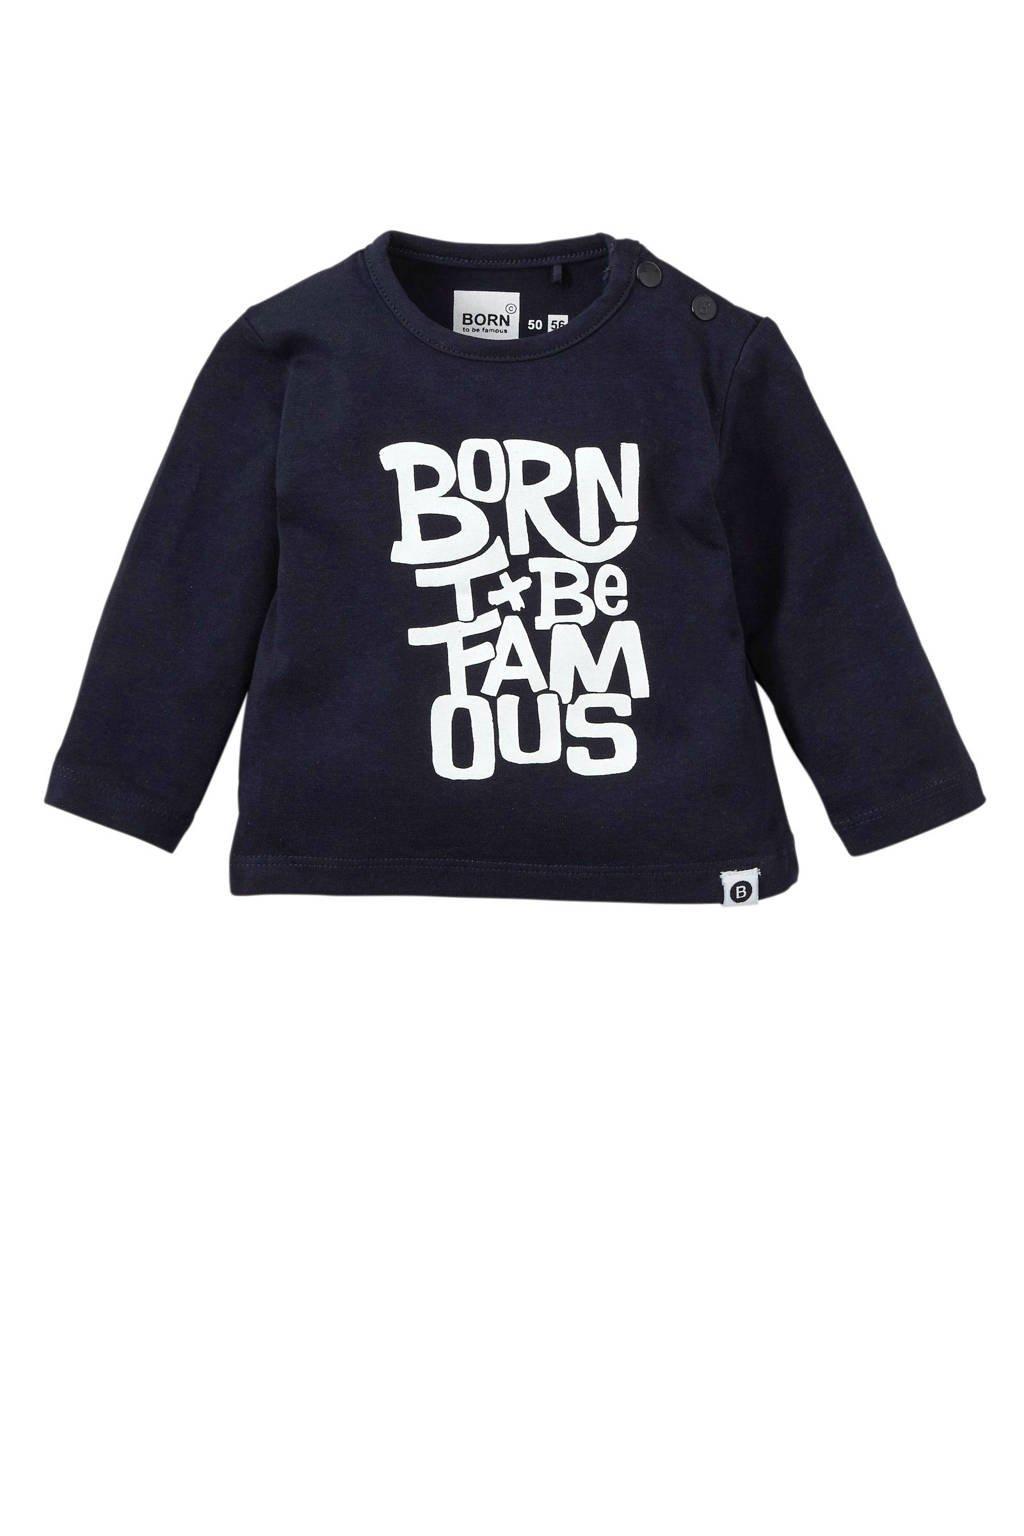 born to be famous. longsleeve met tekst marine/ wit